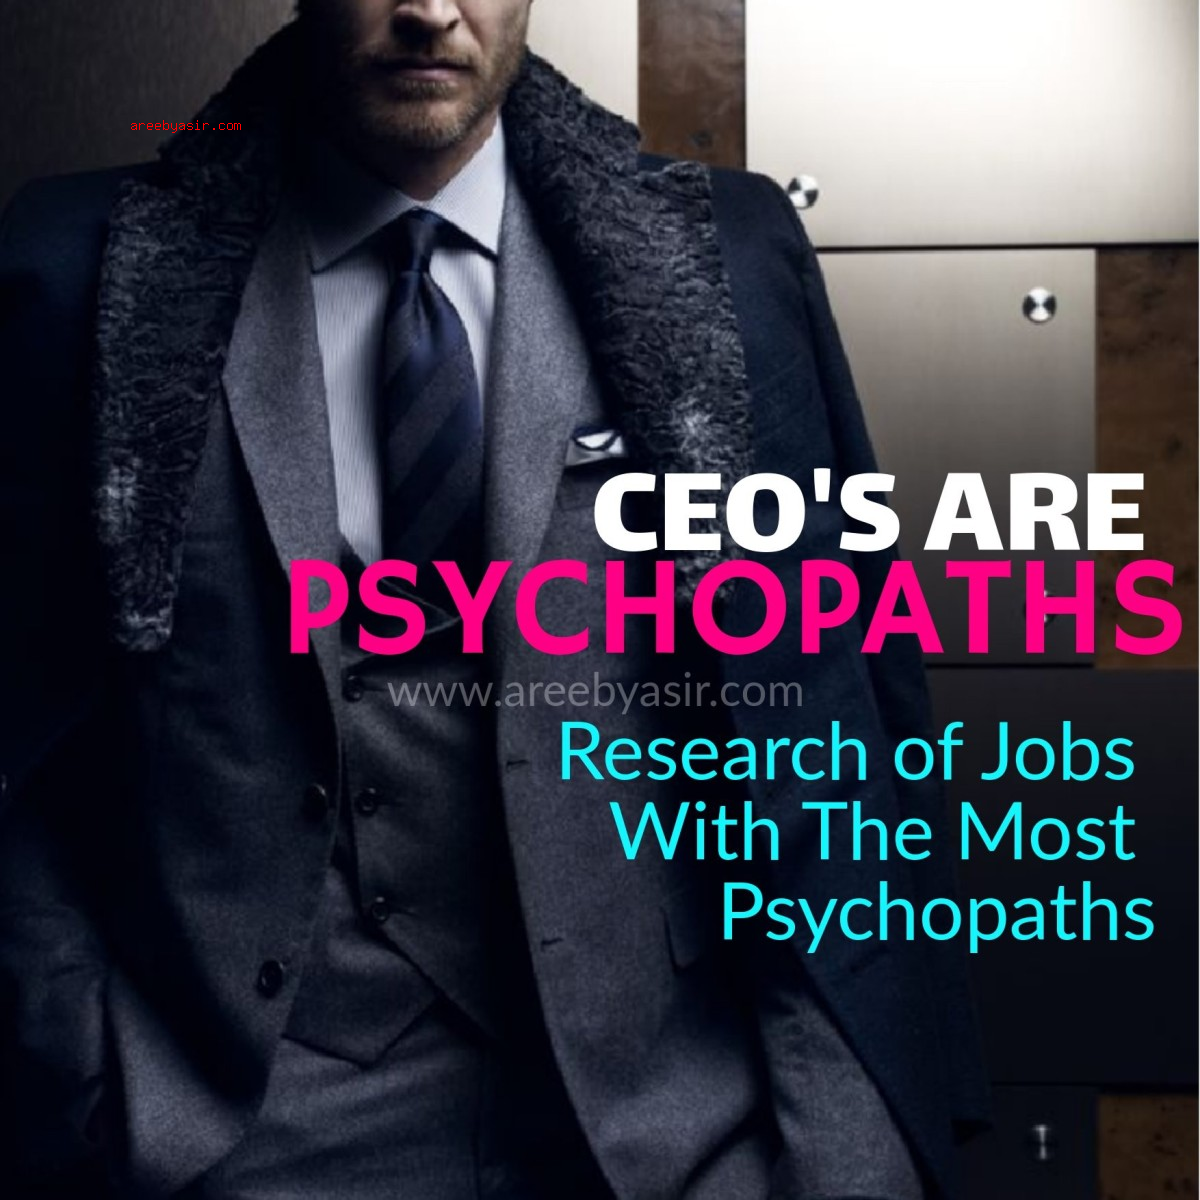 Psychopath CEO's